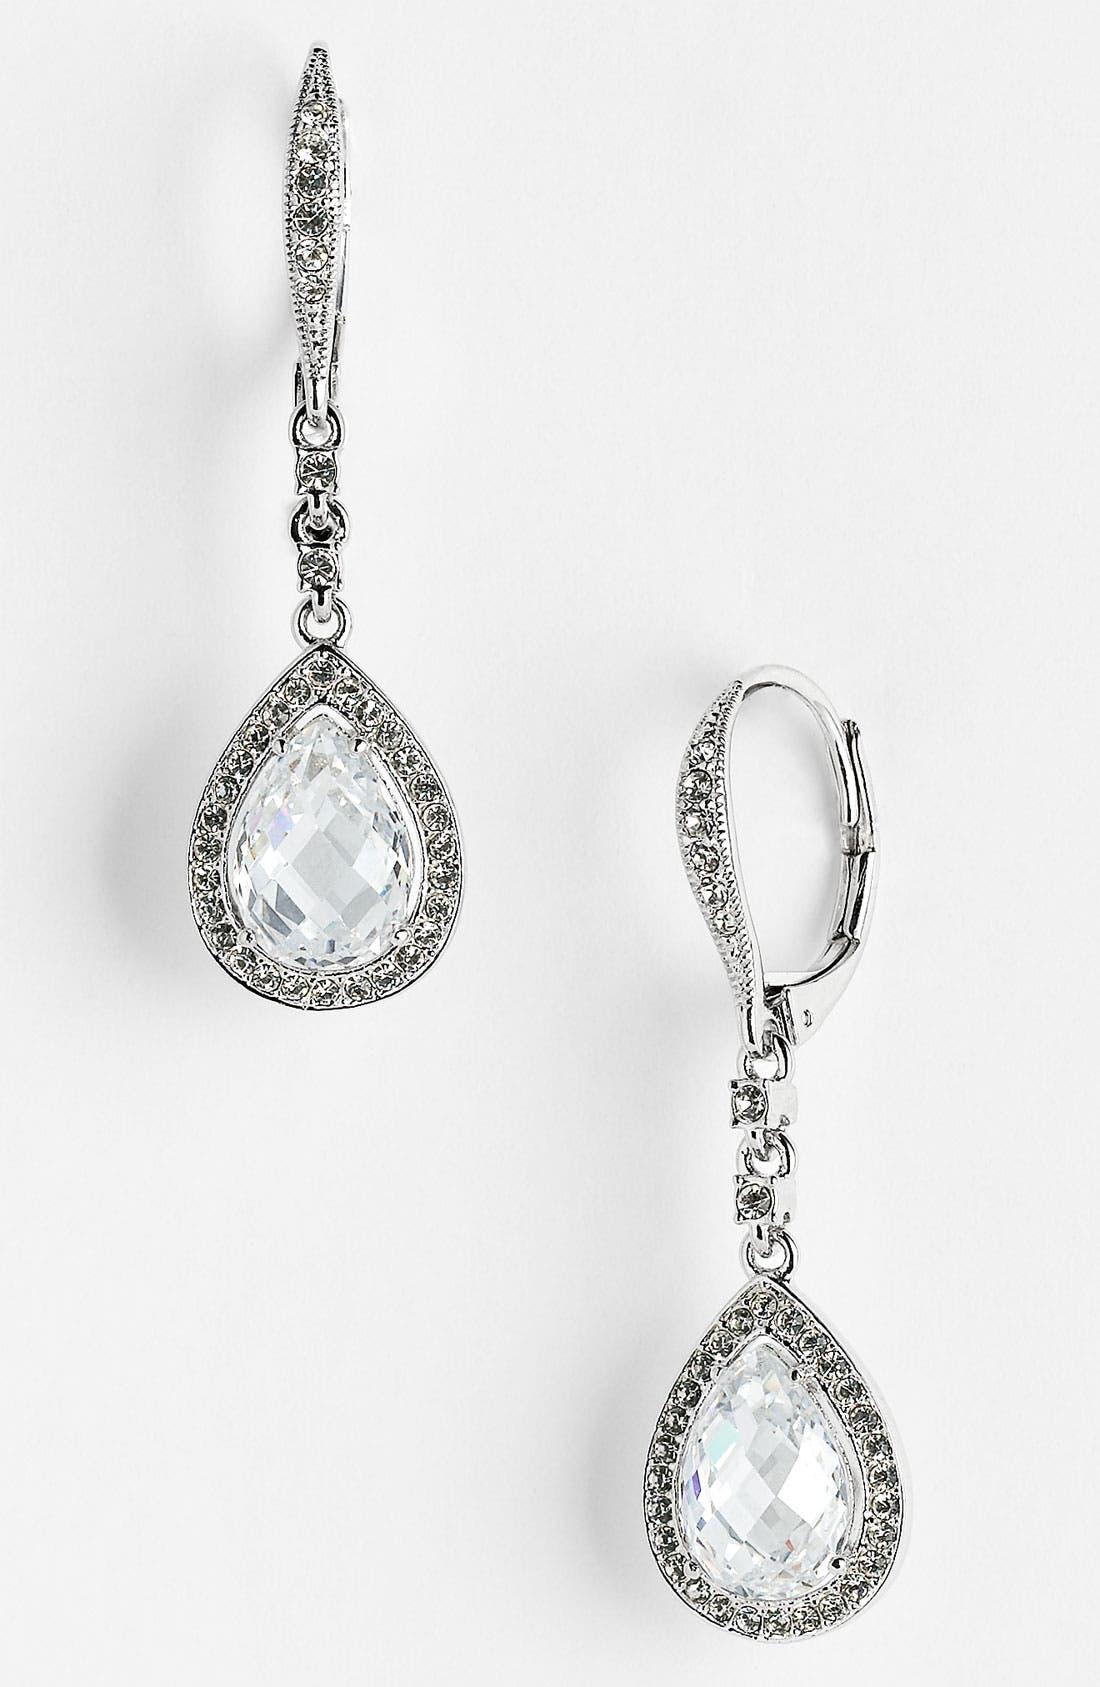 Alternate Image 1 Selected - Nadri Cubic Zirconia Pear Drop Earrings (Nordstrom Exclusive)